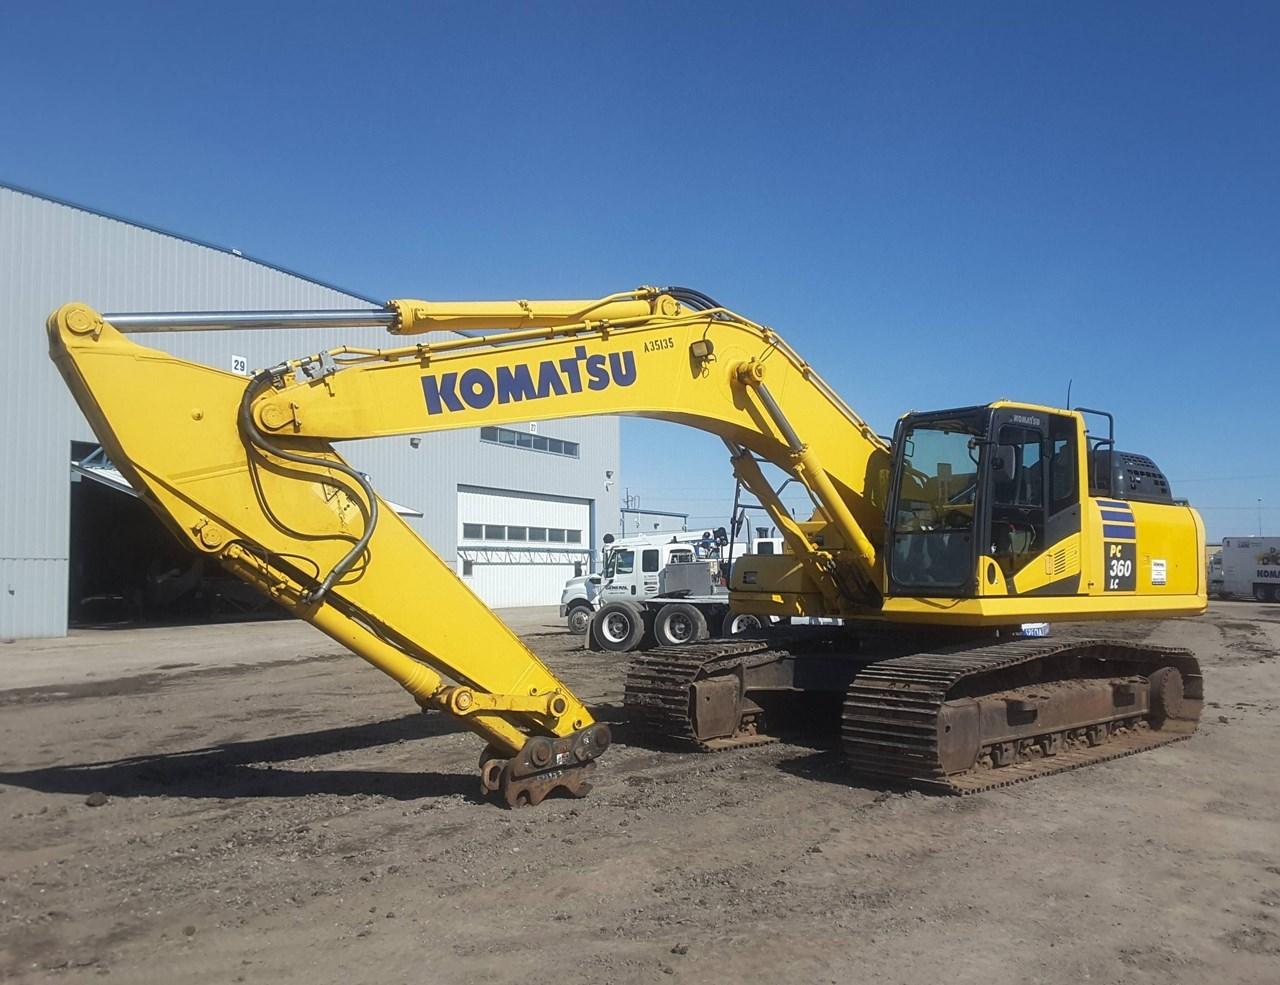 2015 Komatsu PC360LC-11 Excavator For Sale